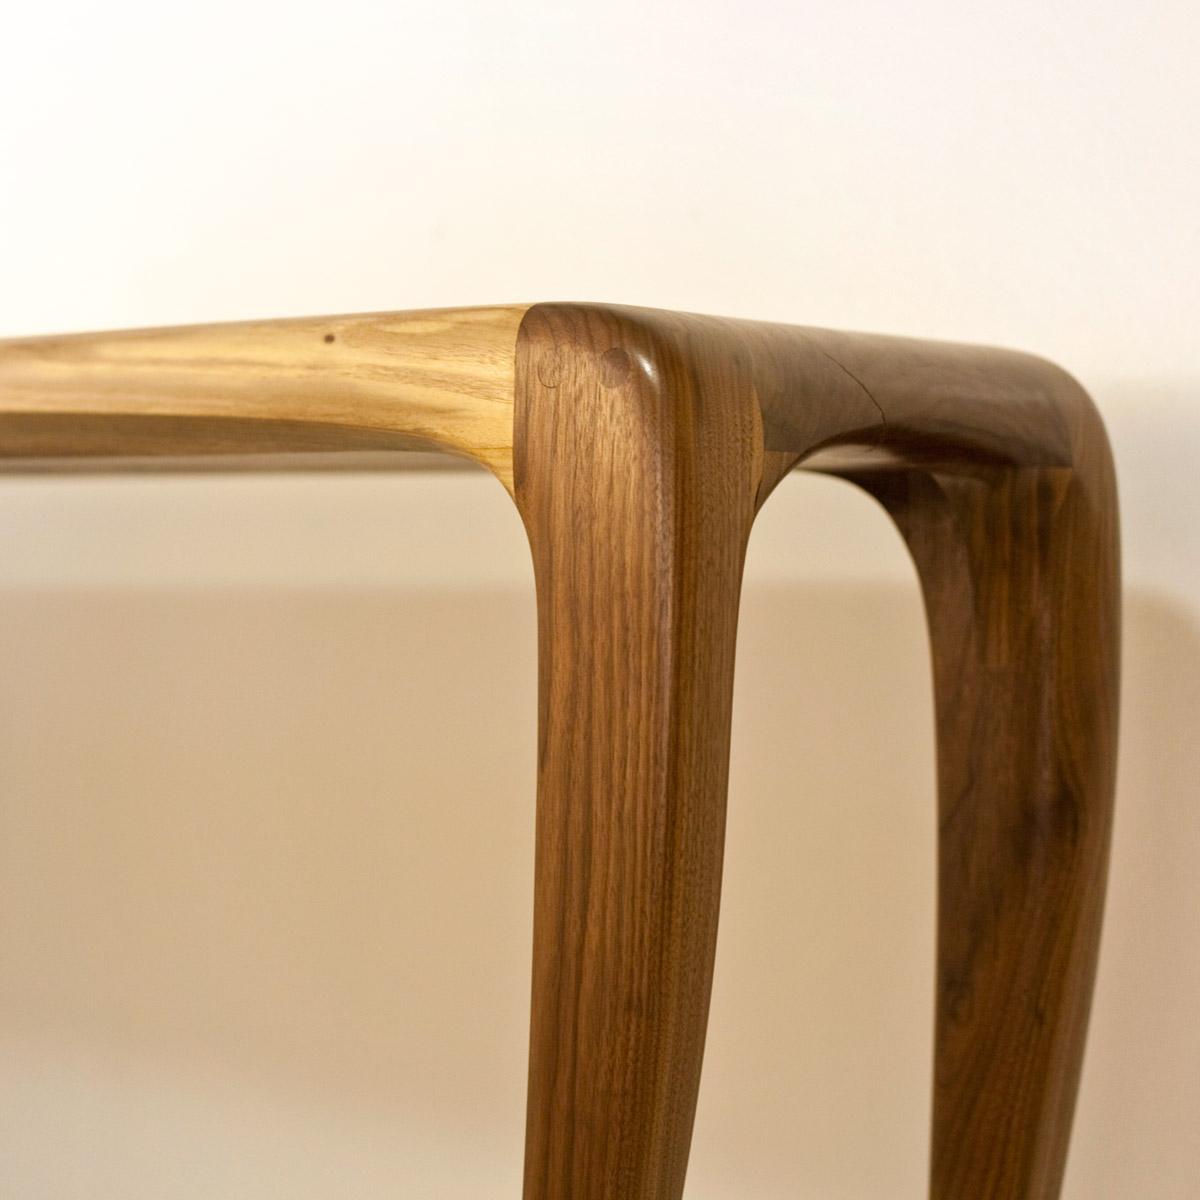 Caleb-Woodard-Hayworth-Side-Table_3.jpg